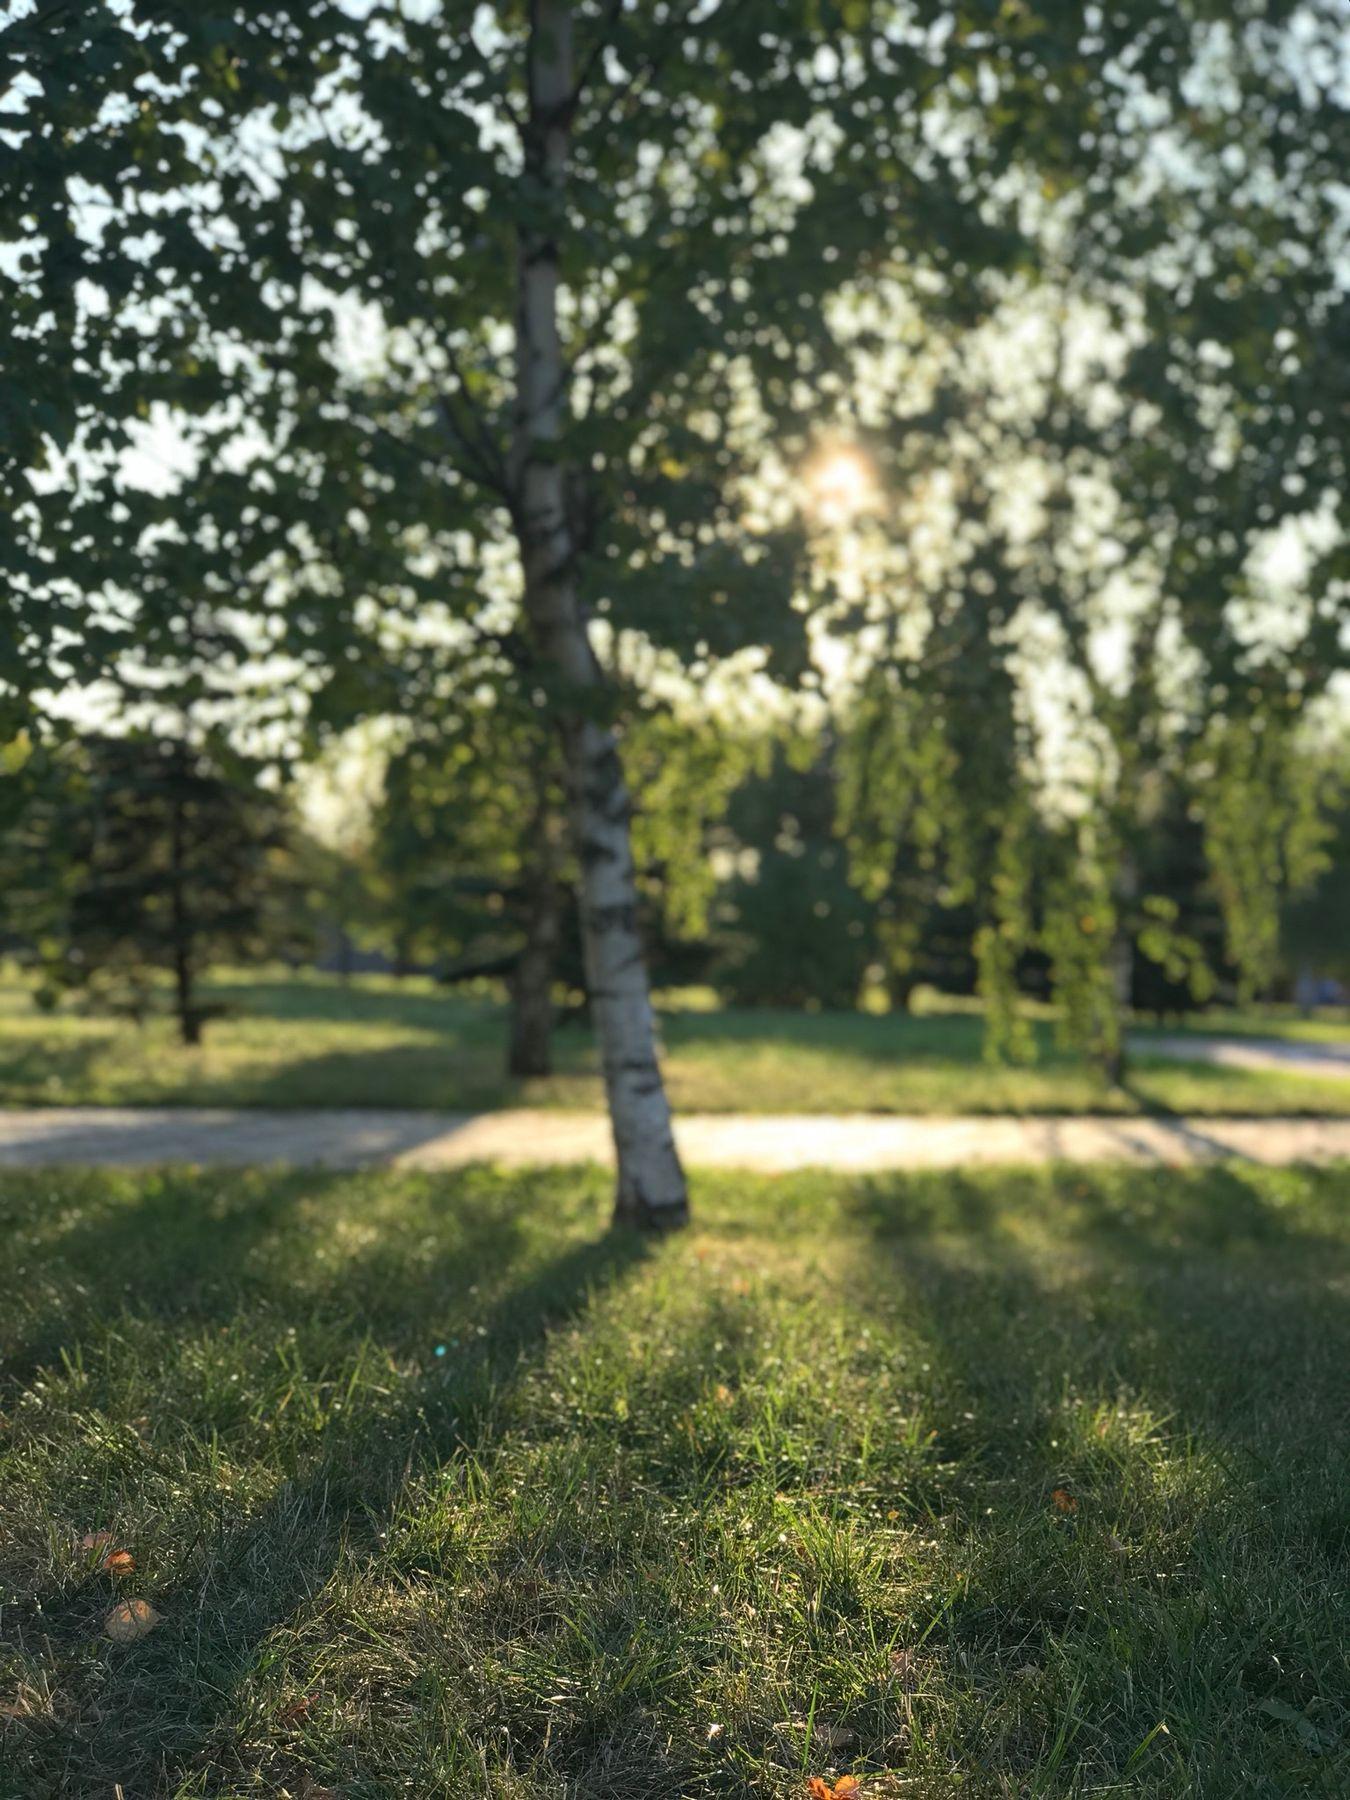 Березка и солнечный свет Солнце берёза дерево трава лето